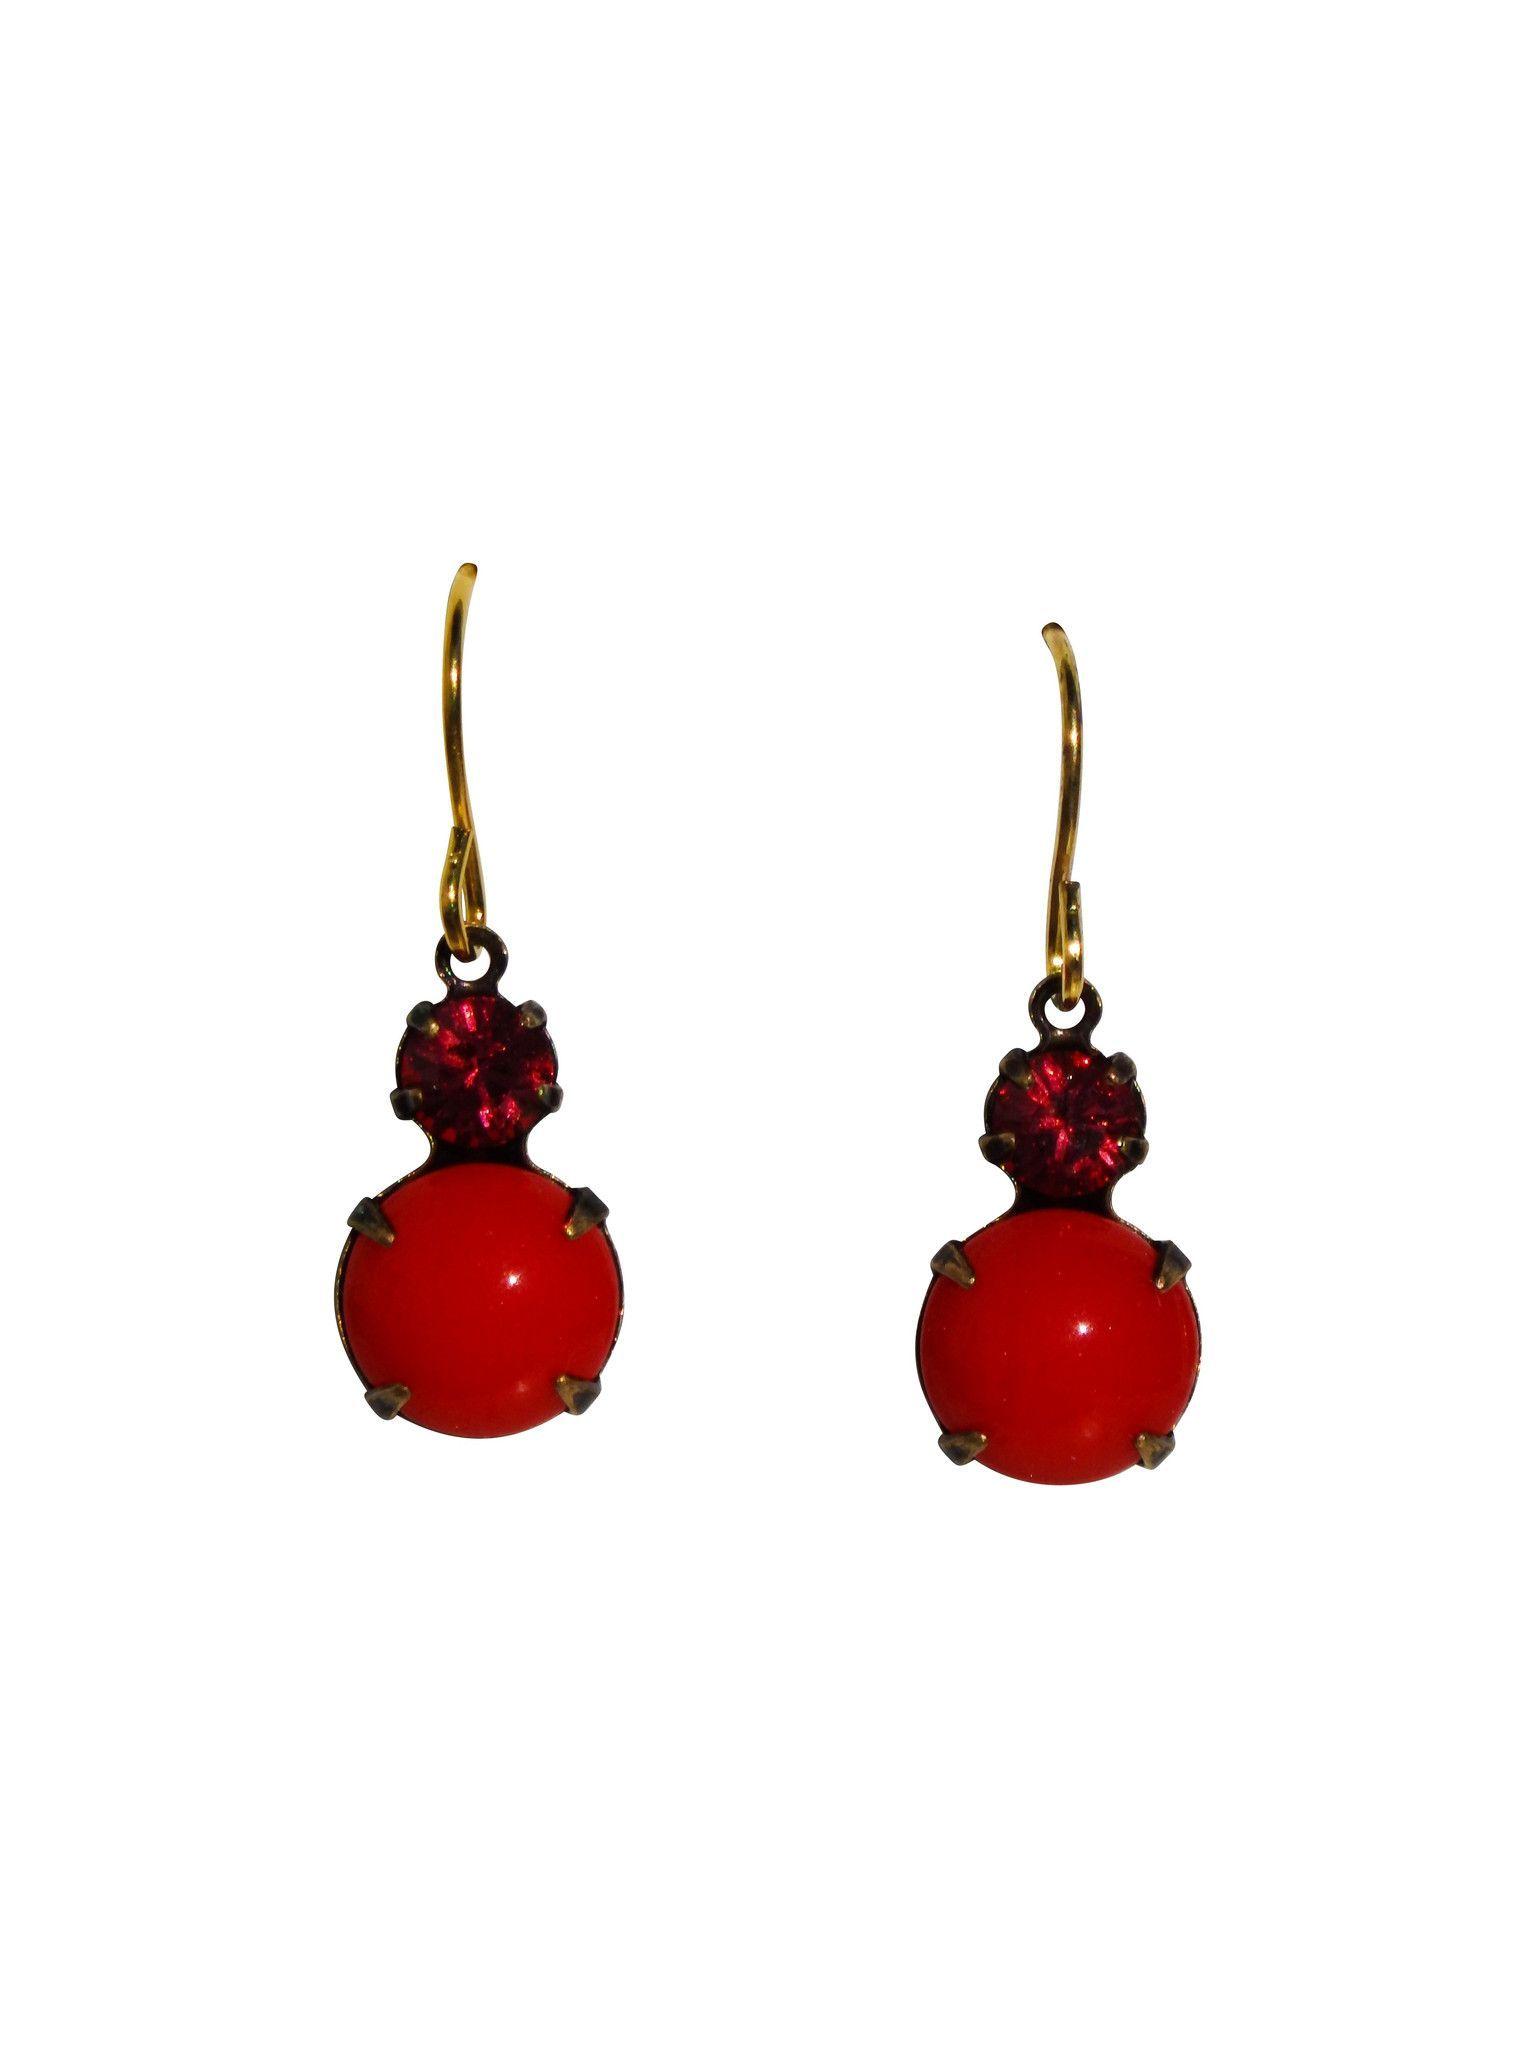 Cherry Pop Earrings - Vintage Rhinestone Glass Jewel